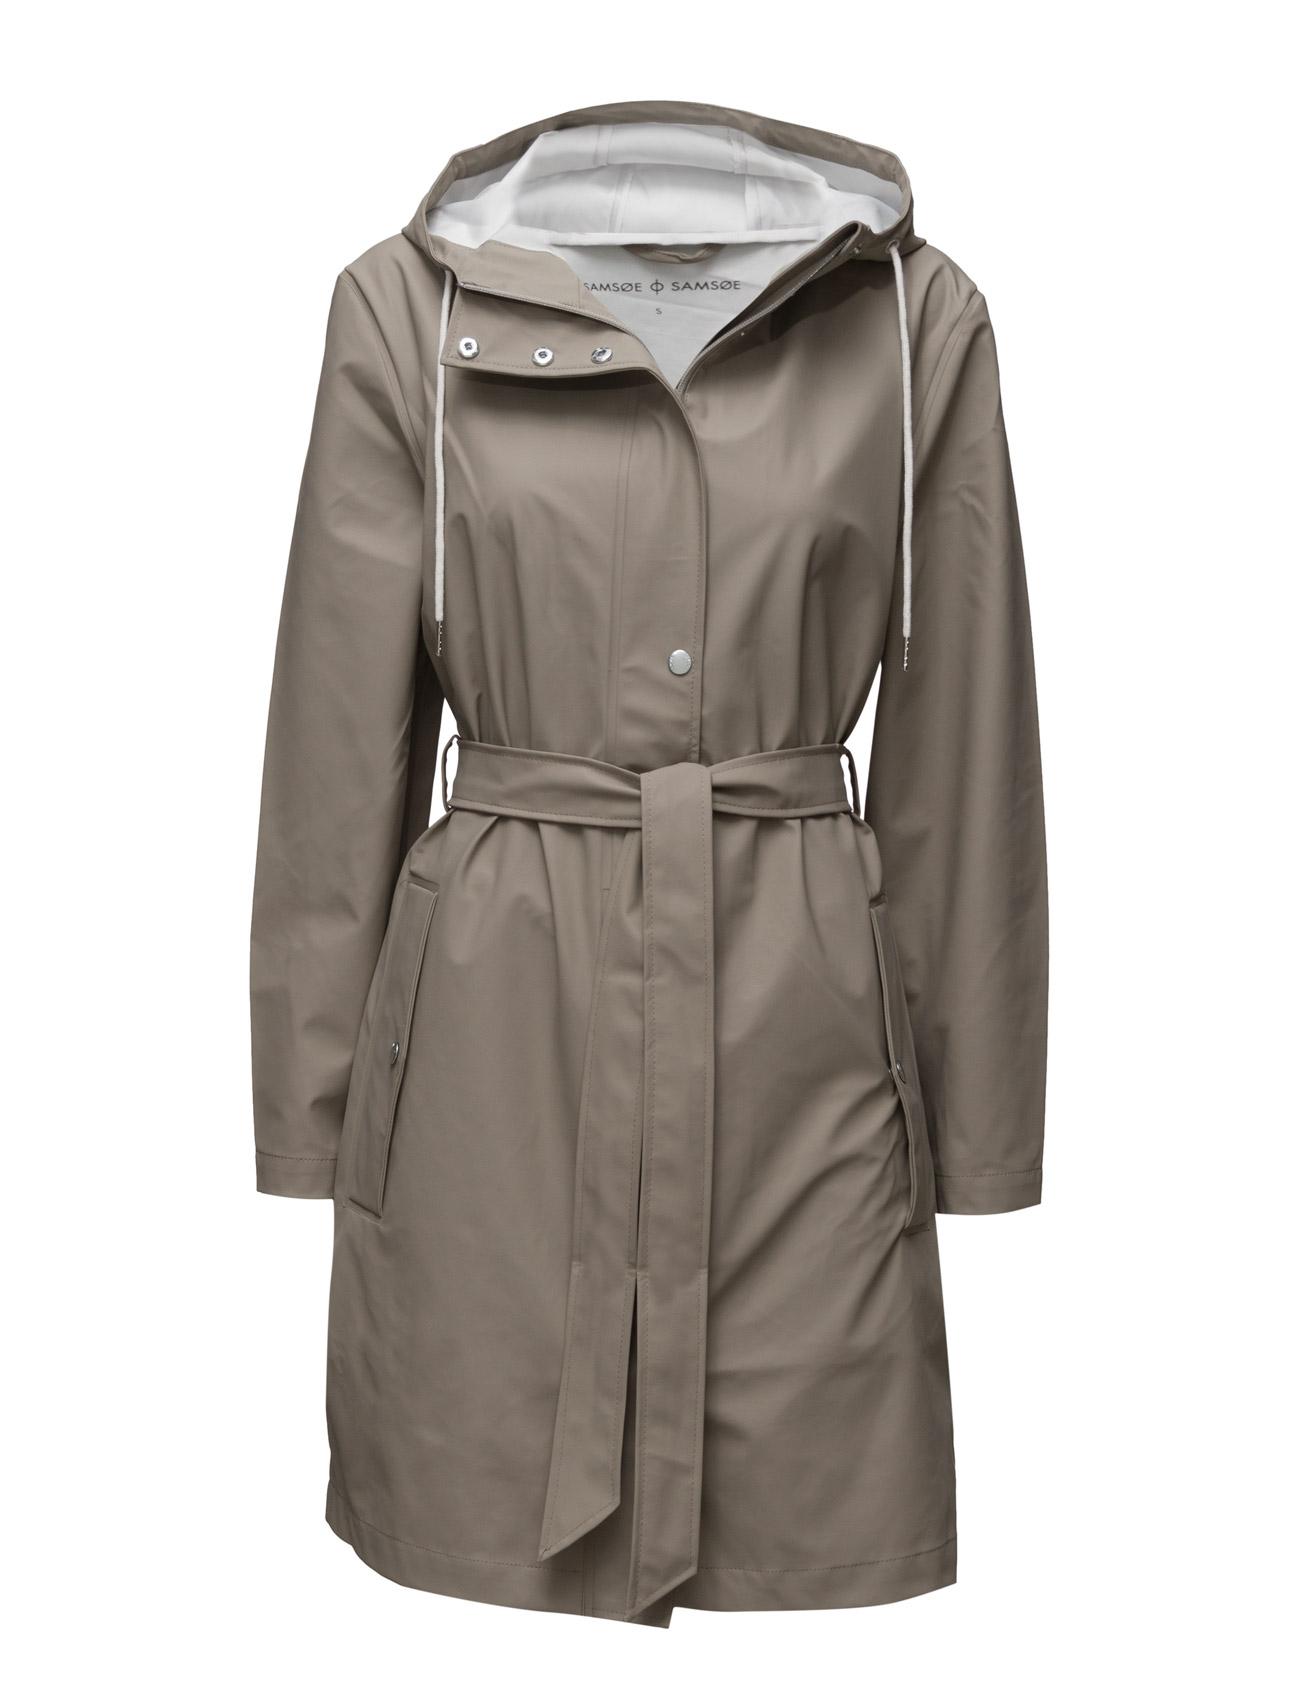 Samsøe & Samsøe Haze jacket 7357